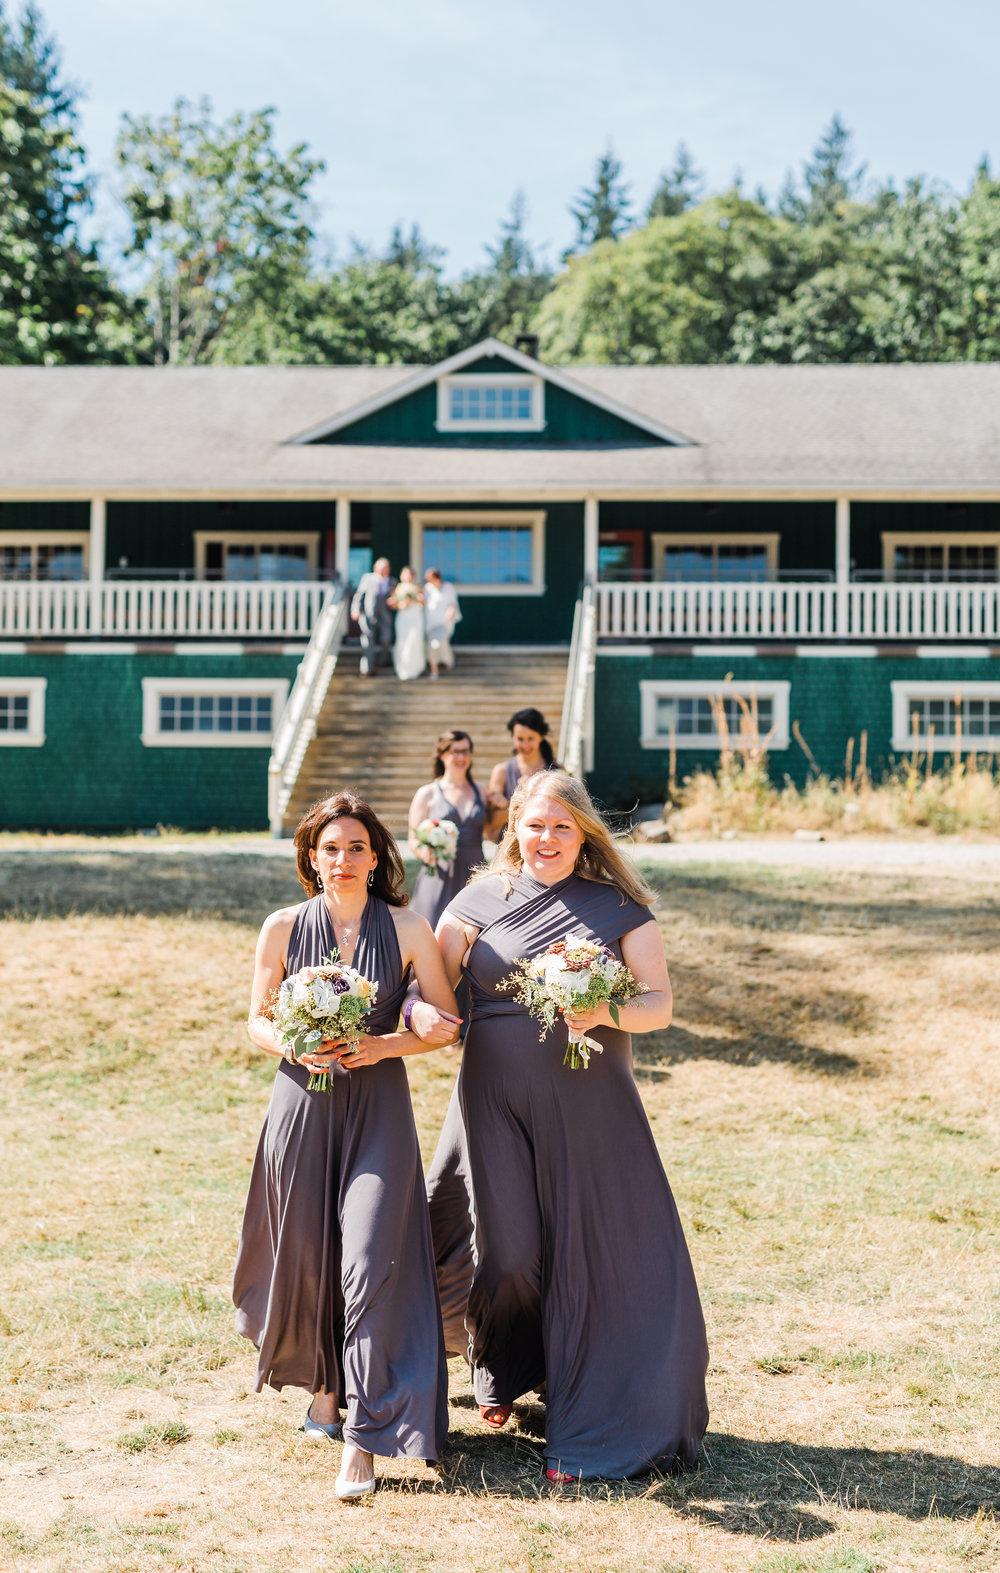 Camp Fircom Wedding - Vancouver Wedding Photographer & Videographer - Sunshine Coast Wedding Photos - Sunshine Coast Wedding Photographer - Jennifer Picard Photography - IMG_0552.jpg